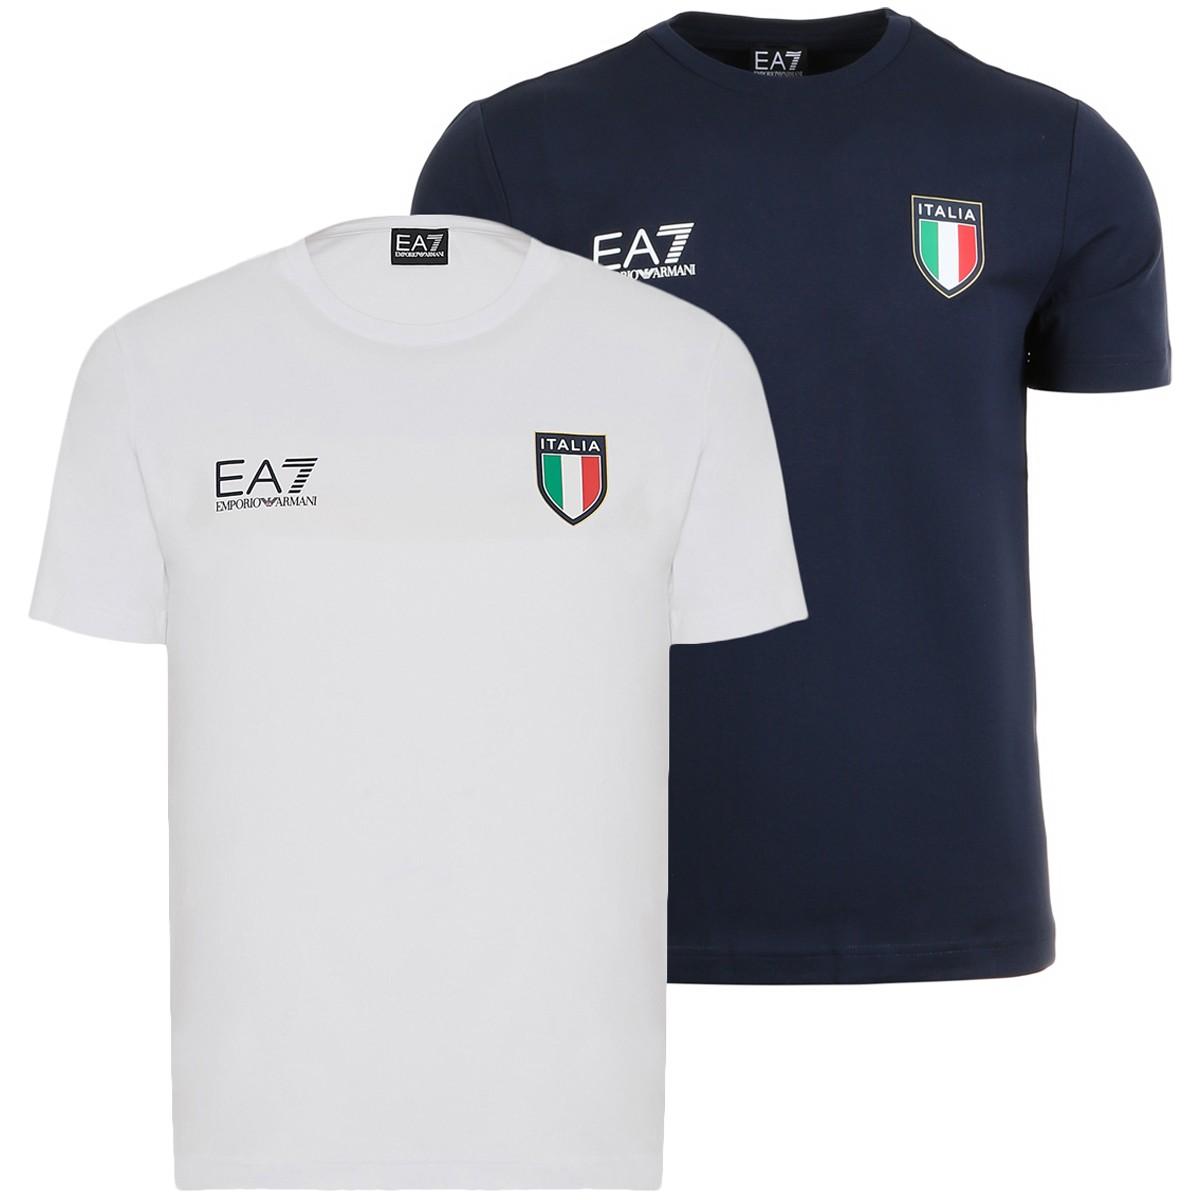 T-SHIRT EA7 ITALIA TEAM OFFICIAL